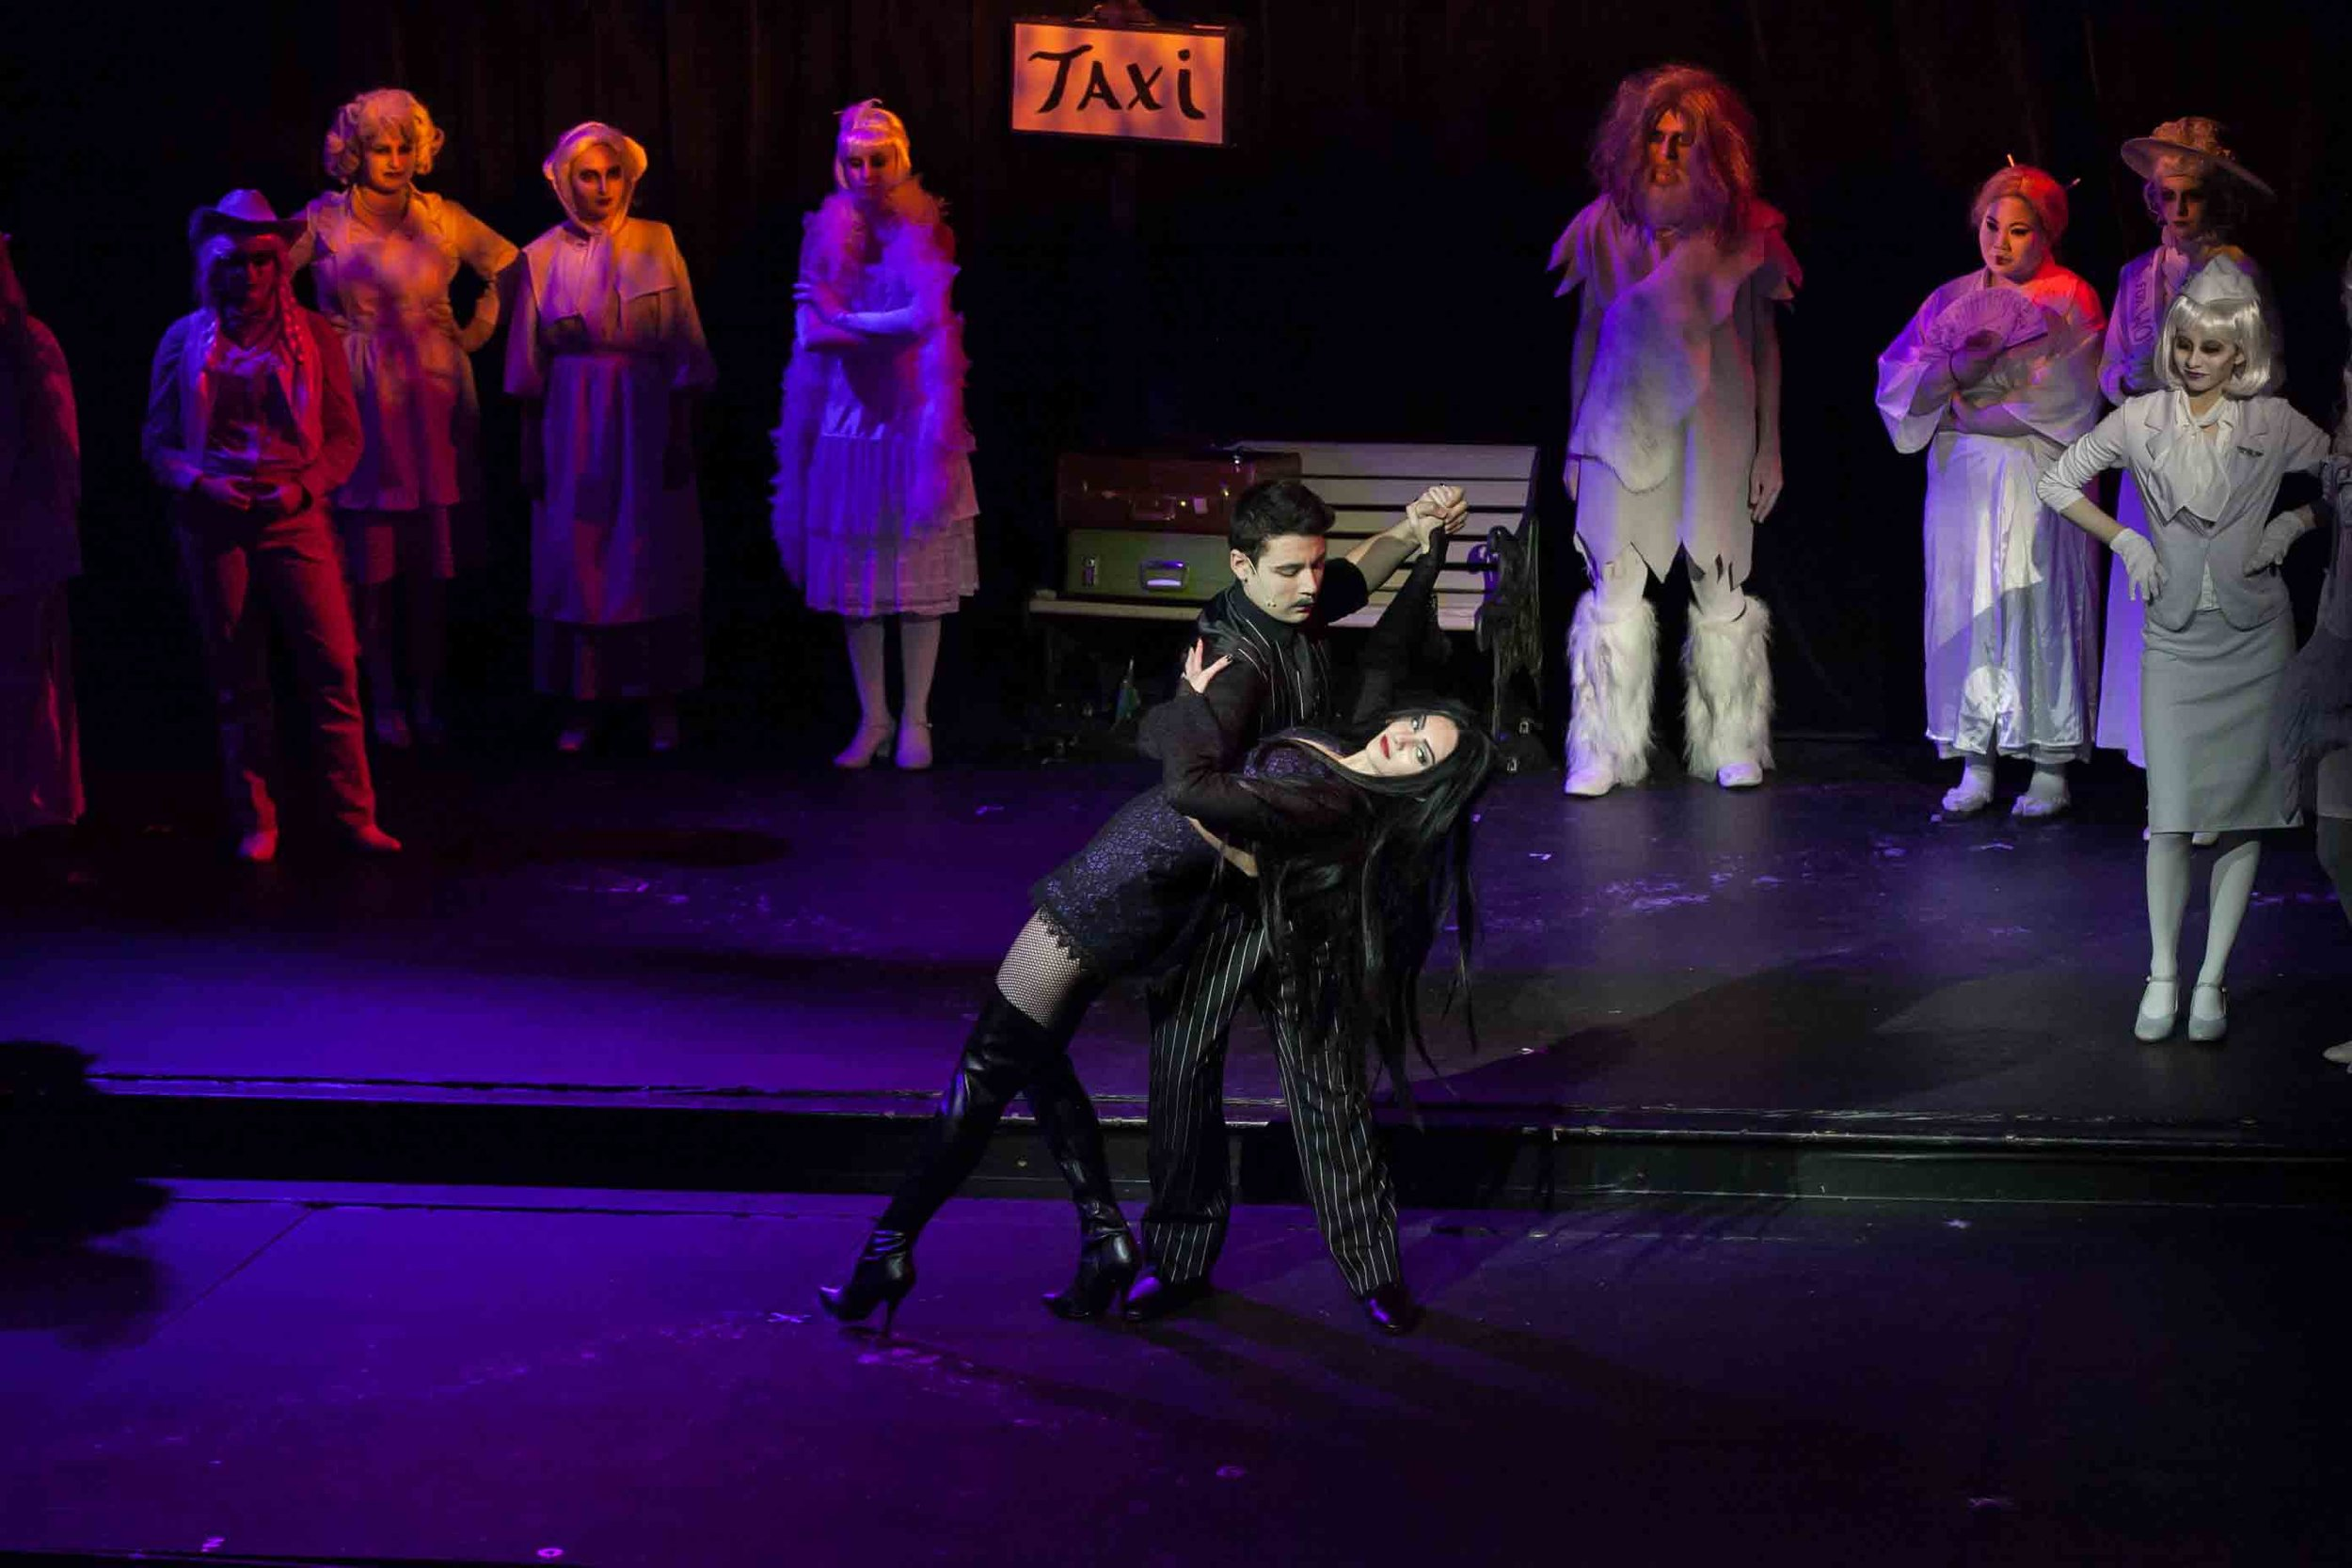 6-19-16 Addams Family Kooky Cast 0392.jpg